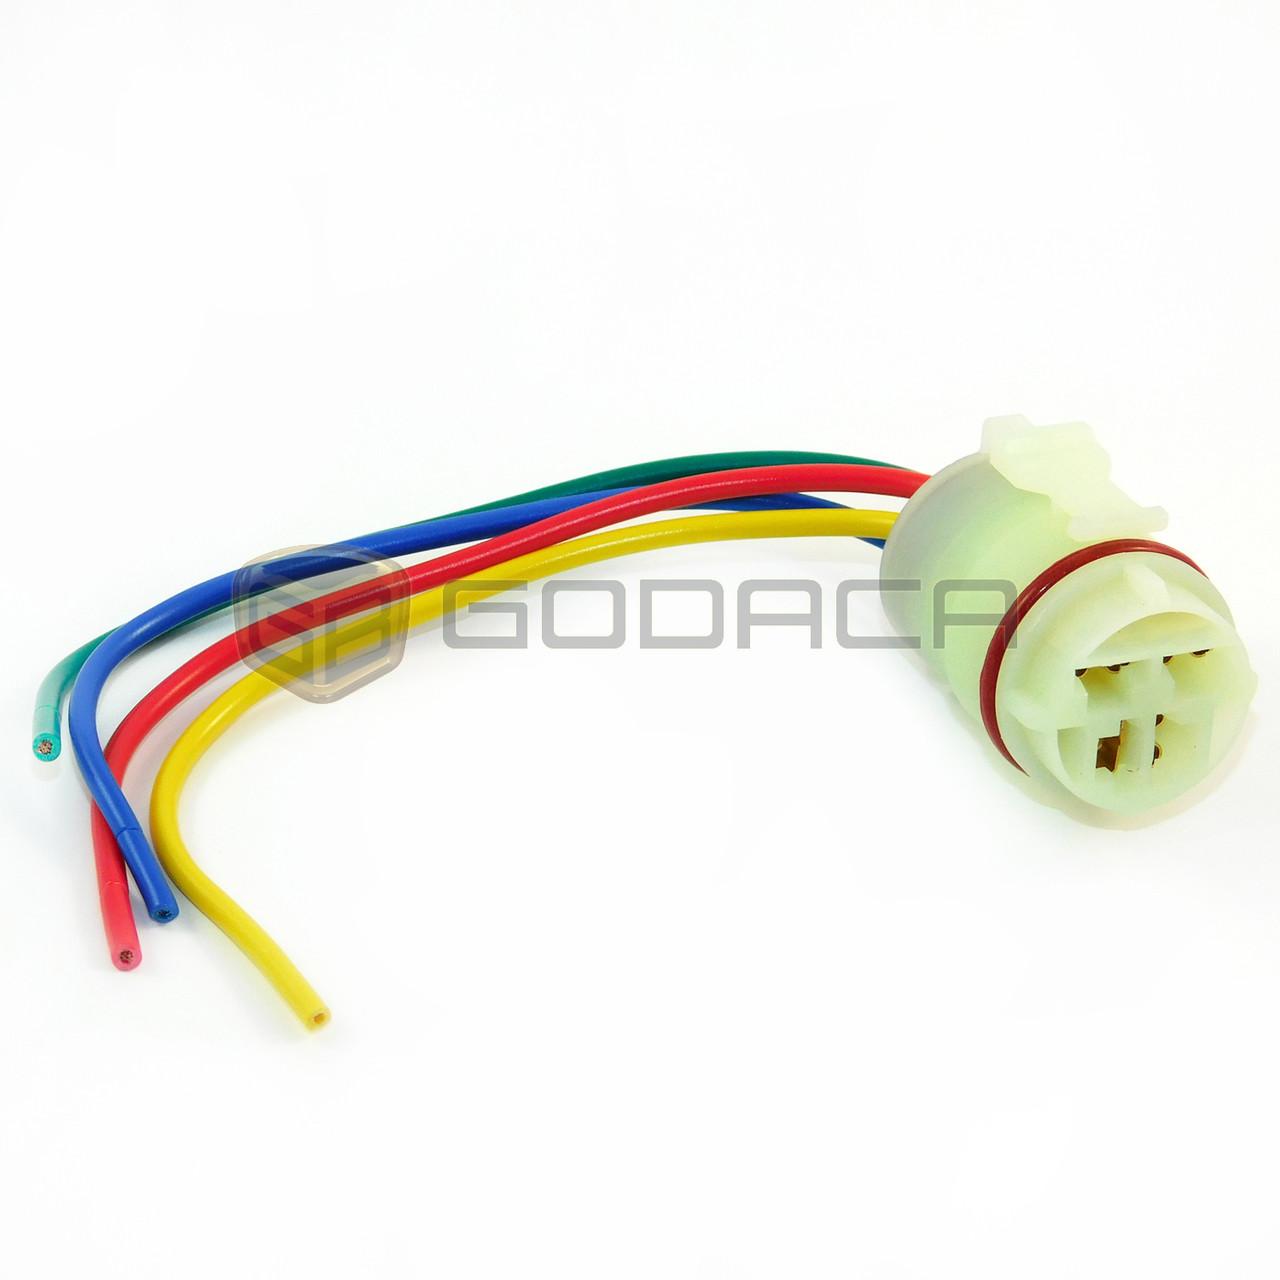 hight resolution of 1 x 4 way connector alternator repair plug harness universal for gm gm wiring harness repair